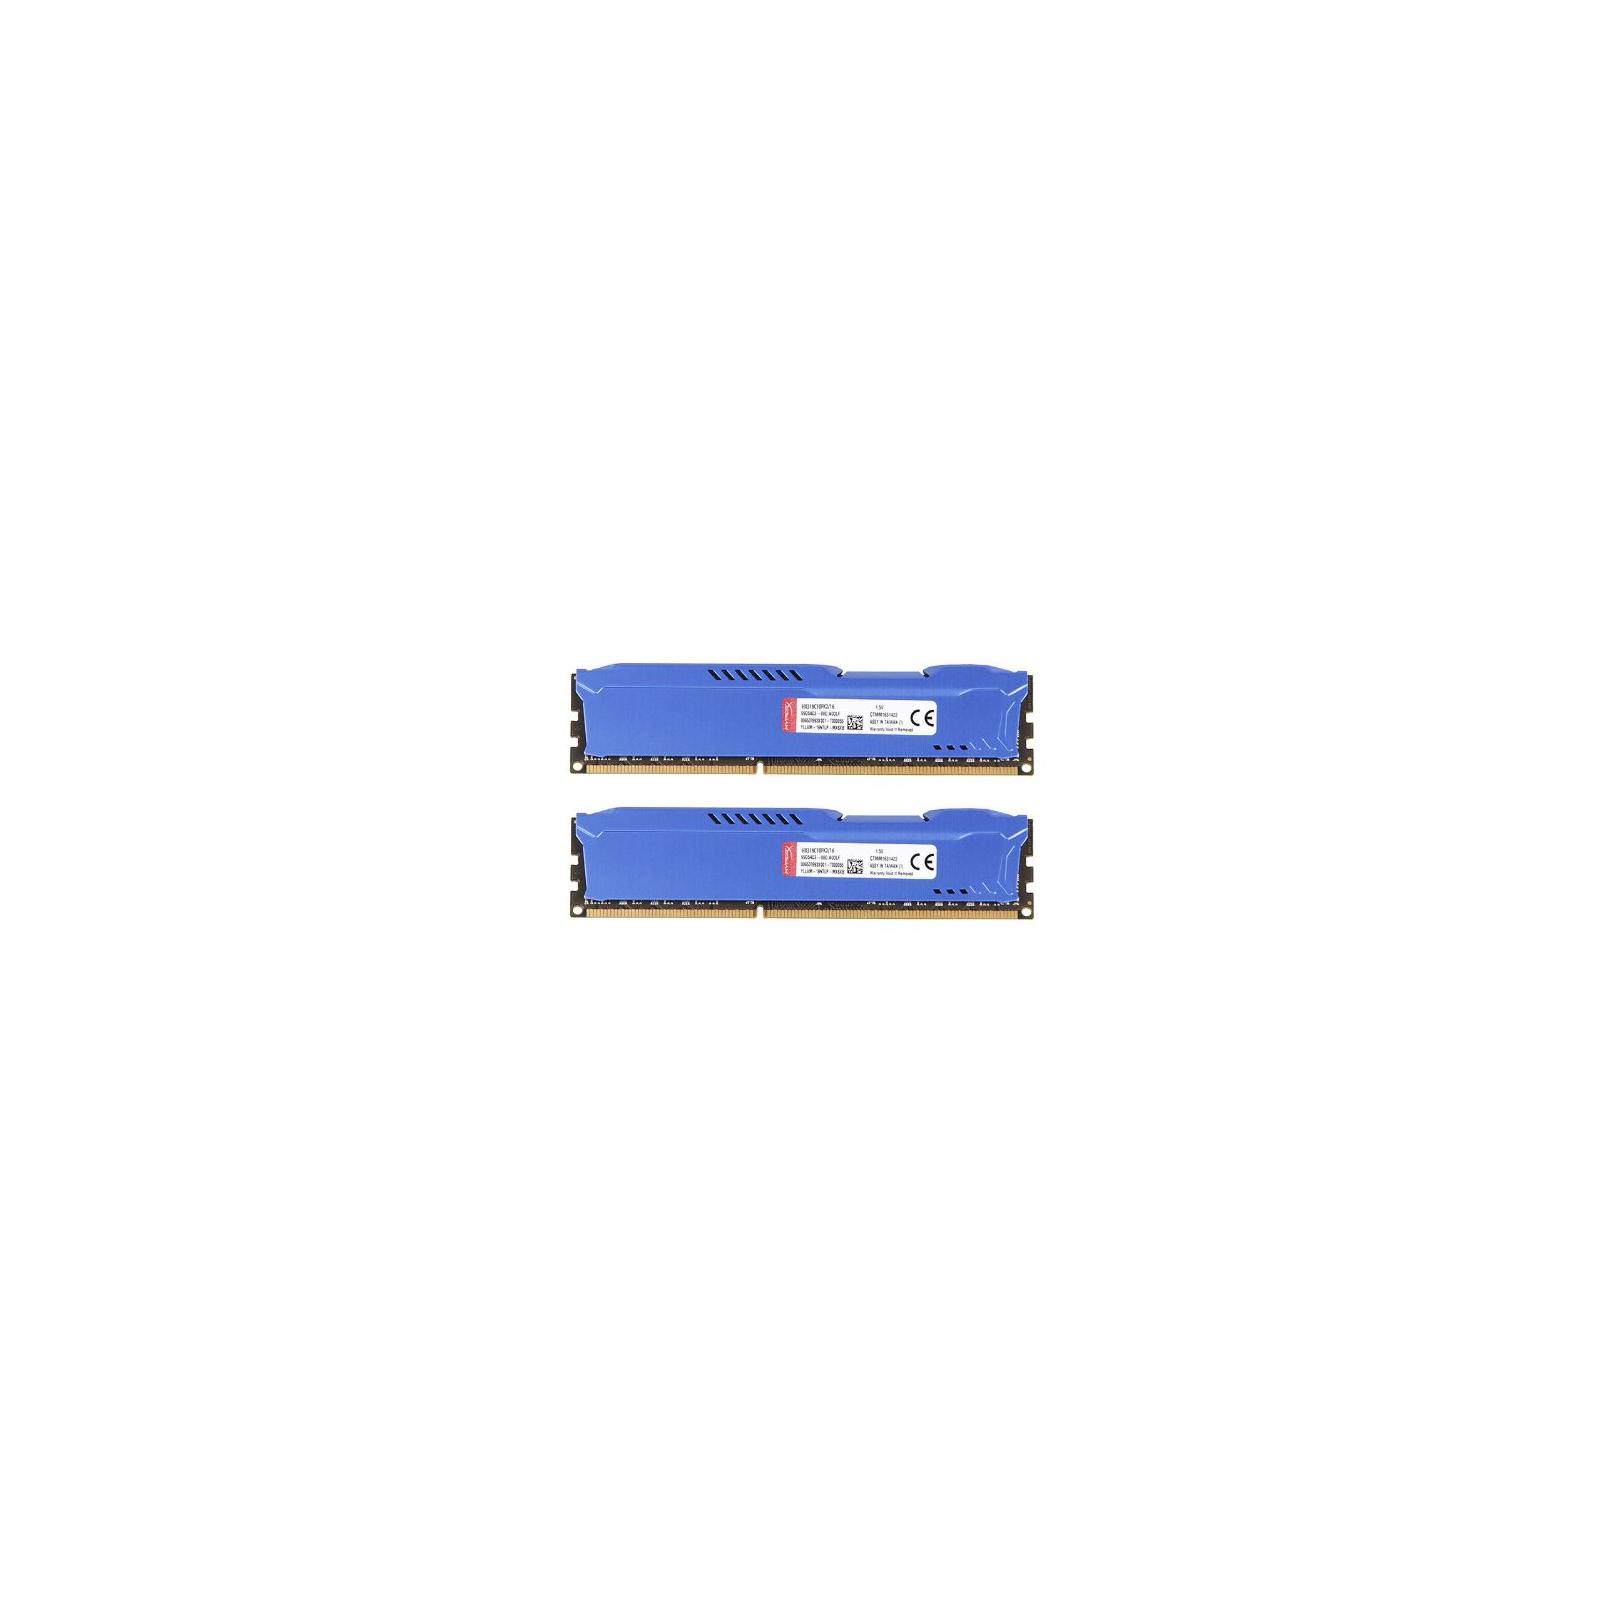 Модуль памяти для компьютера DDR3 16Gb (2x8GB) 1866 MHz HyperX Fury Blu Kingston (HX318C10FK2/16) изображение 4